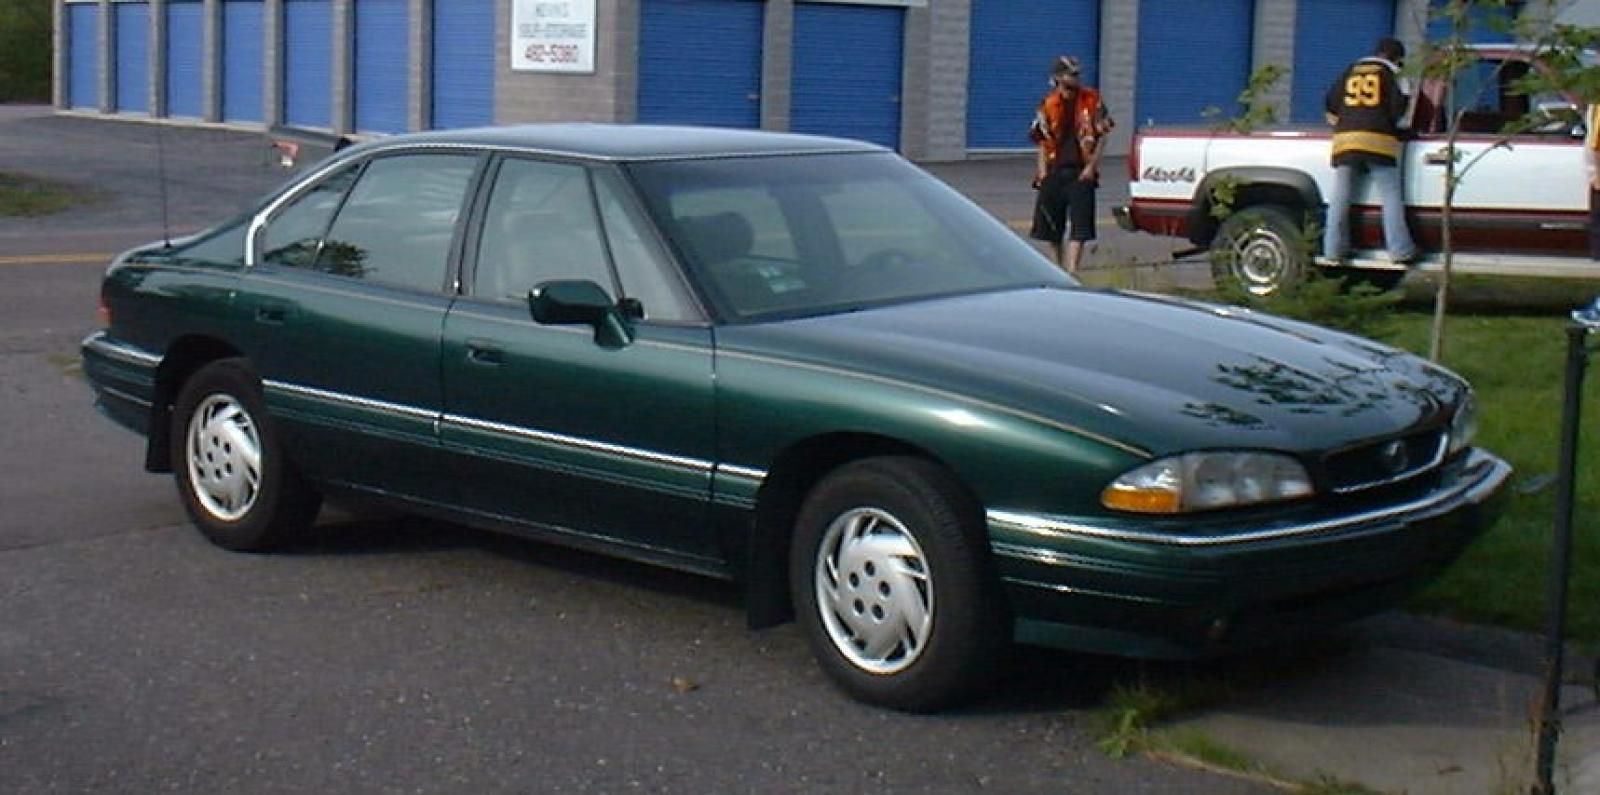 800 1024 1280 1600 Origin 1992 Pontiac Bonneville